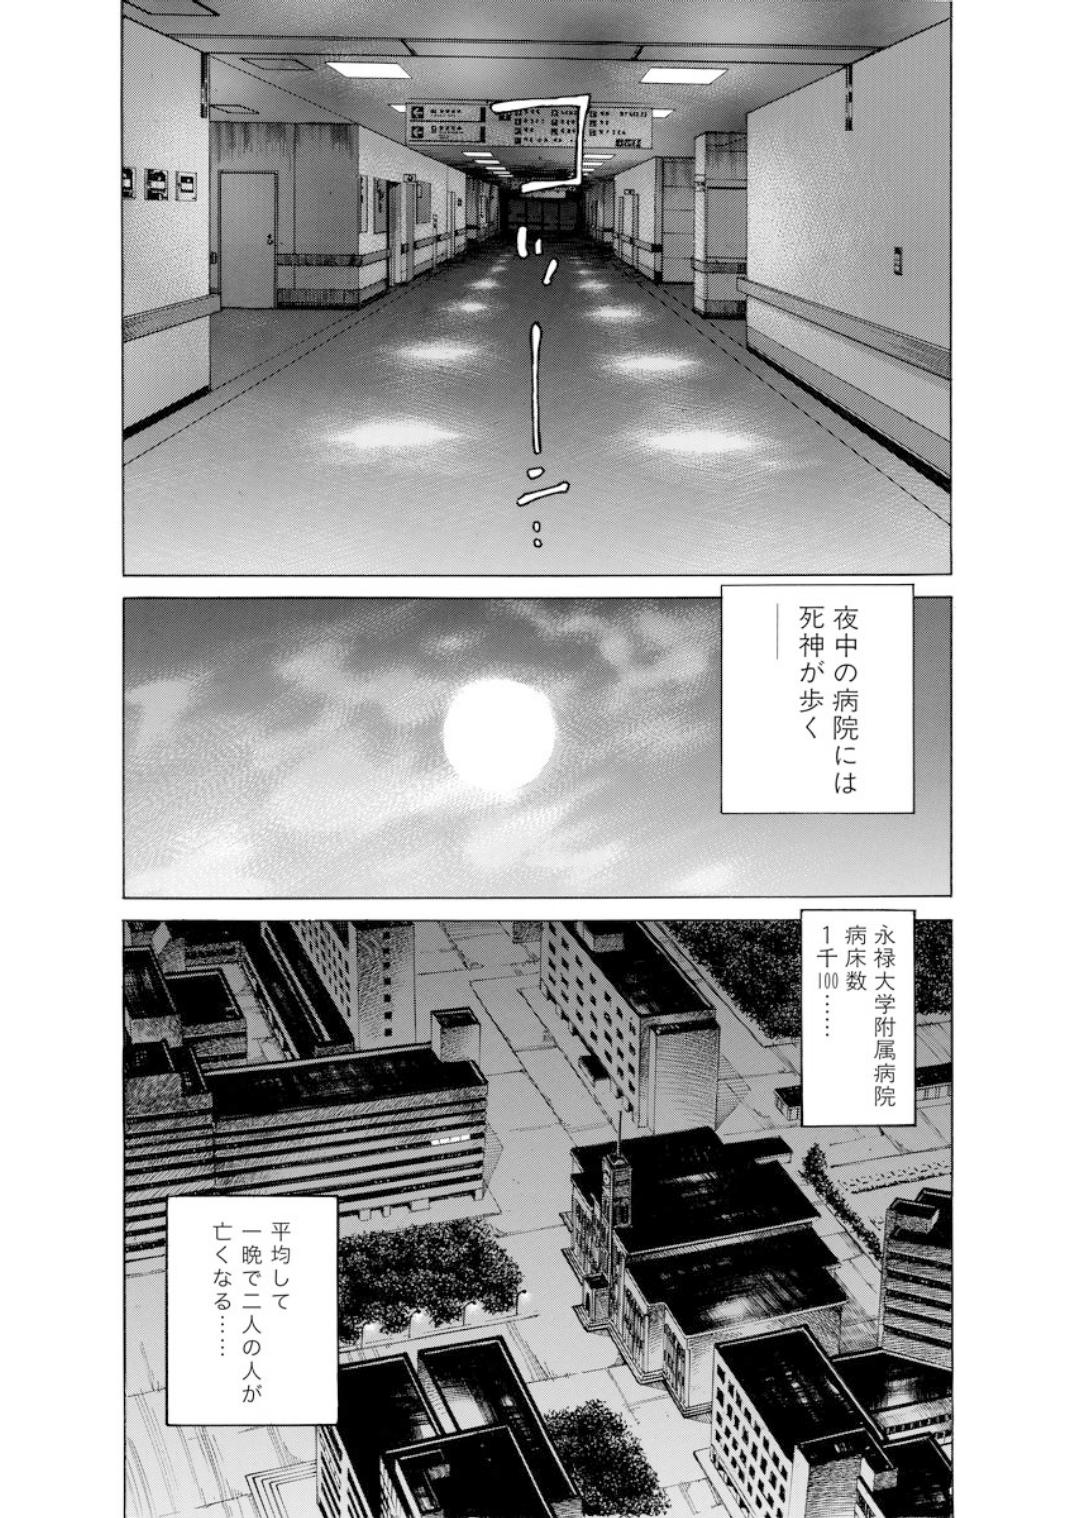 001bj_page-0106.jpg